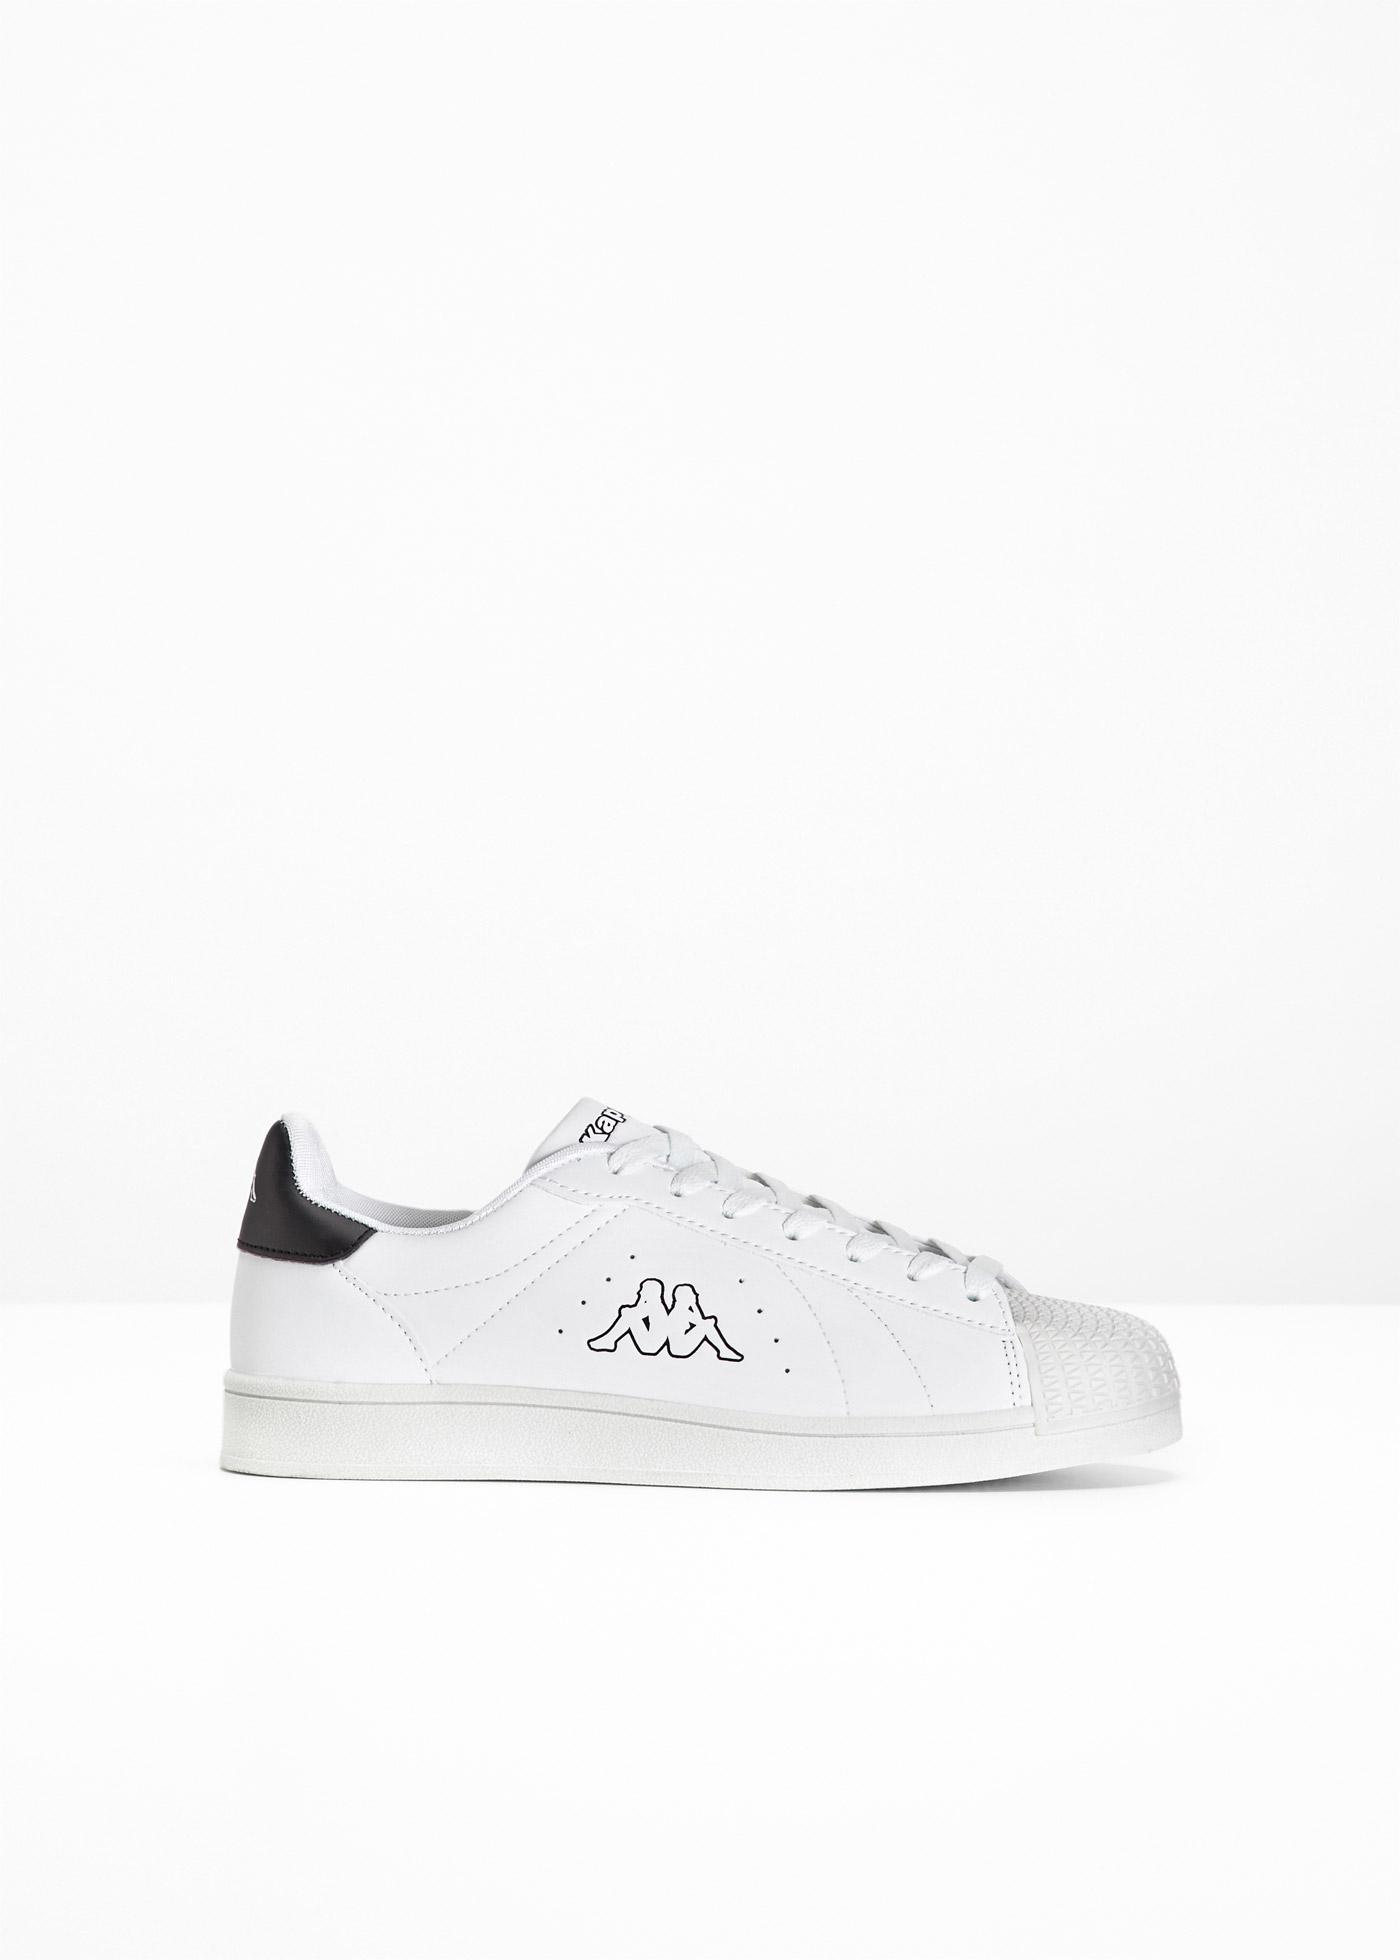 Bonprix - Sneakers fr??n Kappa 399.00